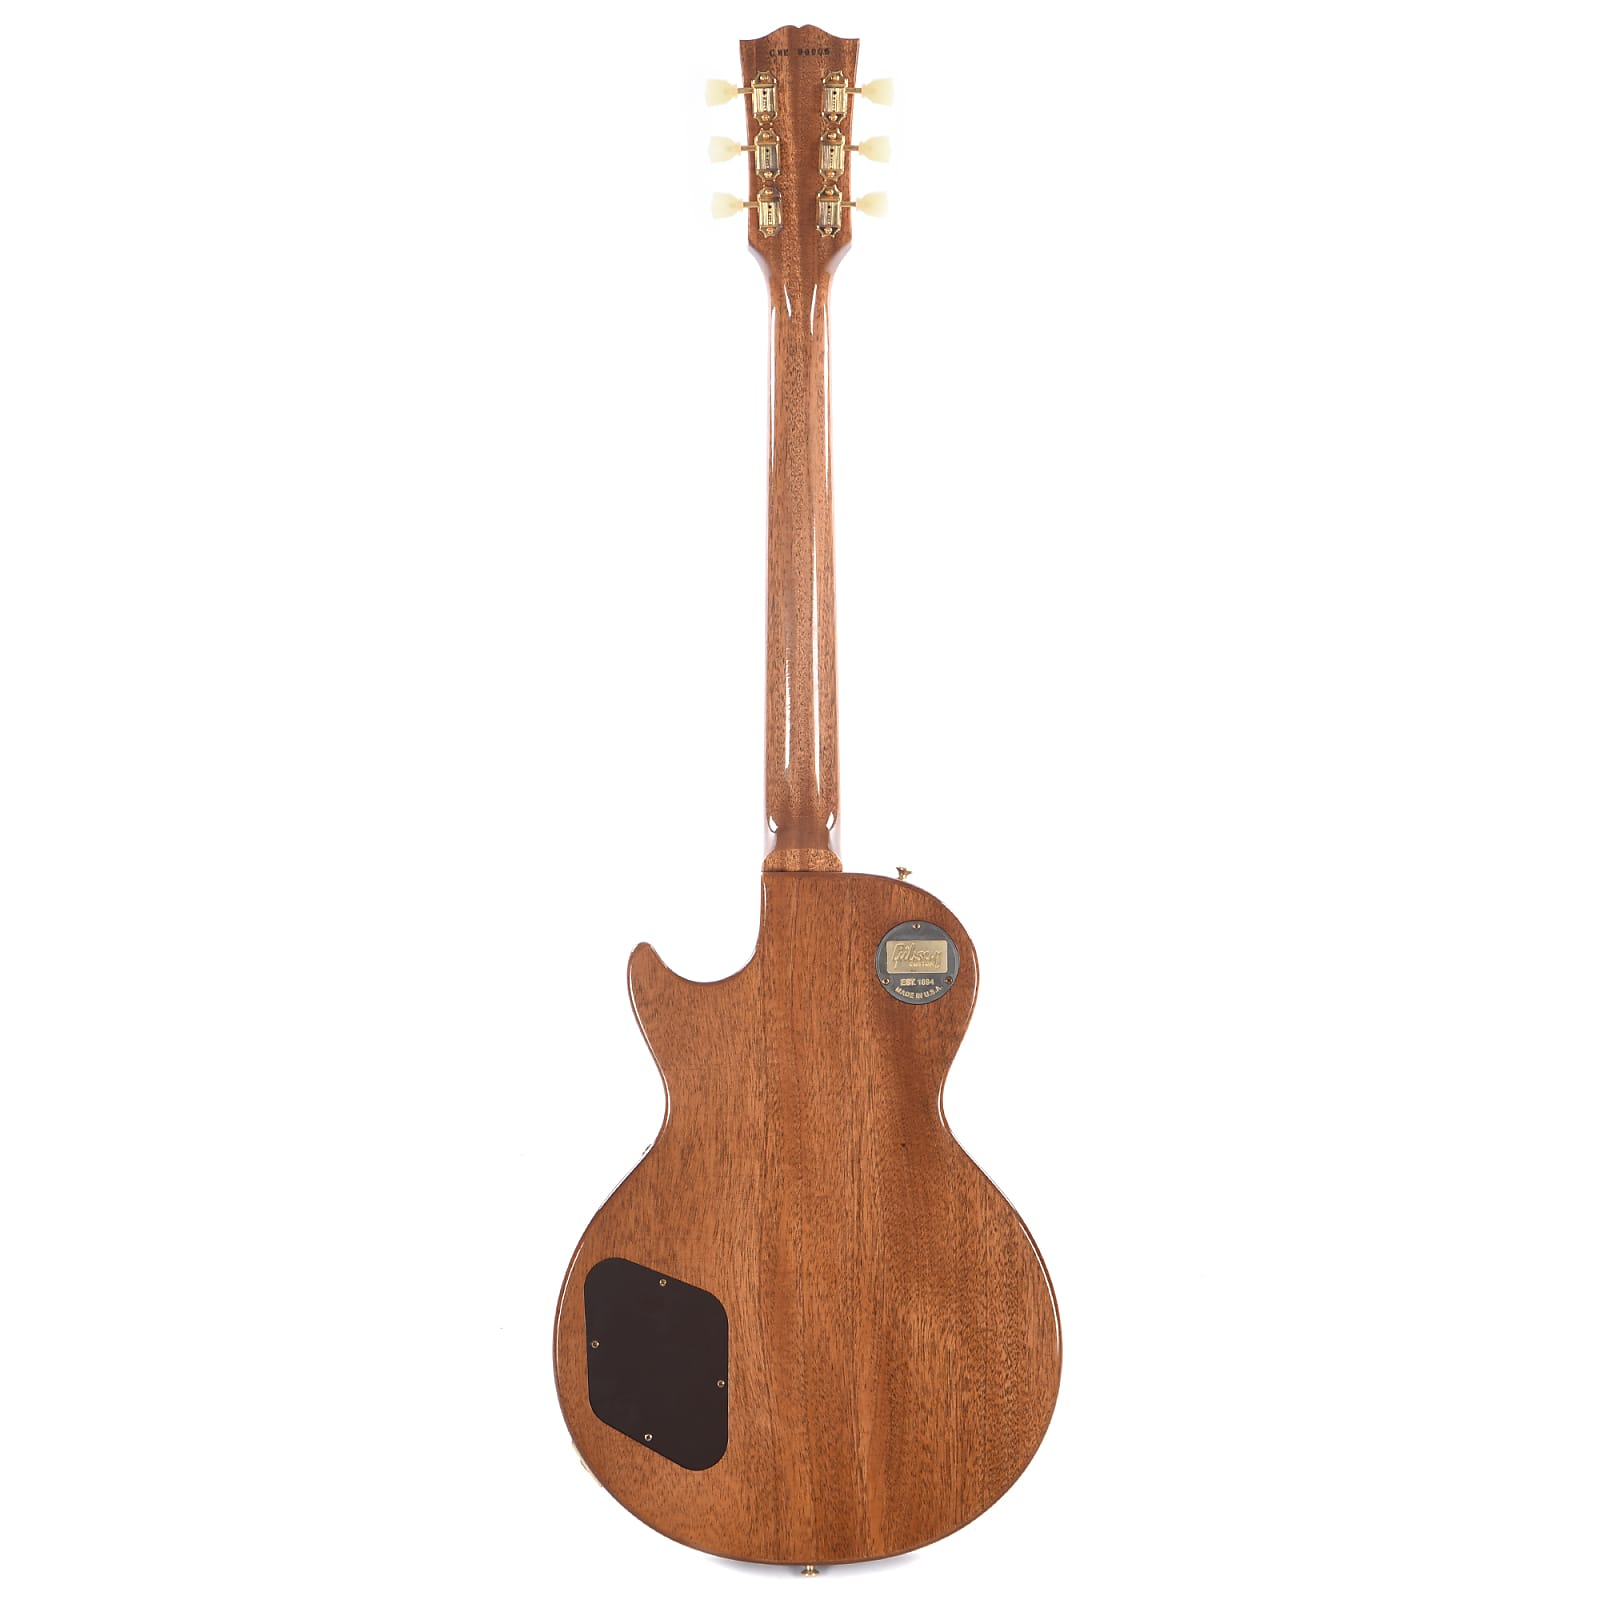 Gibson Custom 1956 Les Paul Standard Antique Sparkling Burgundy Lightly Aged 2019 (Serial #CME90005)